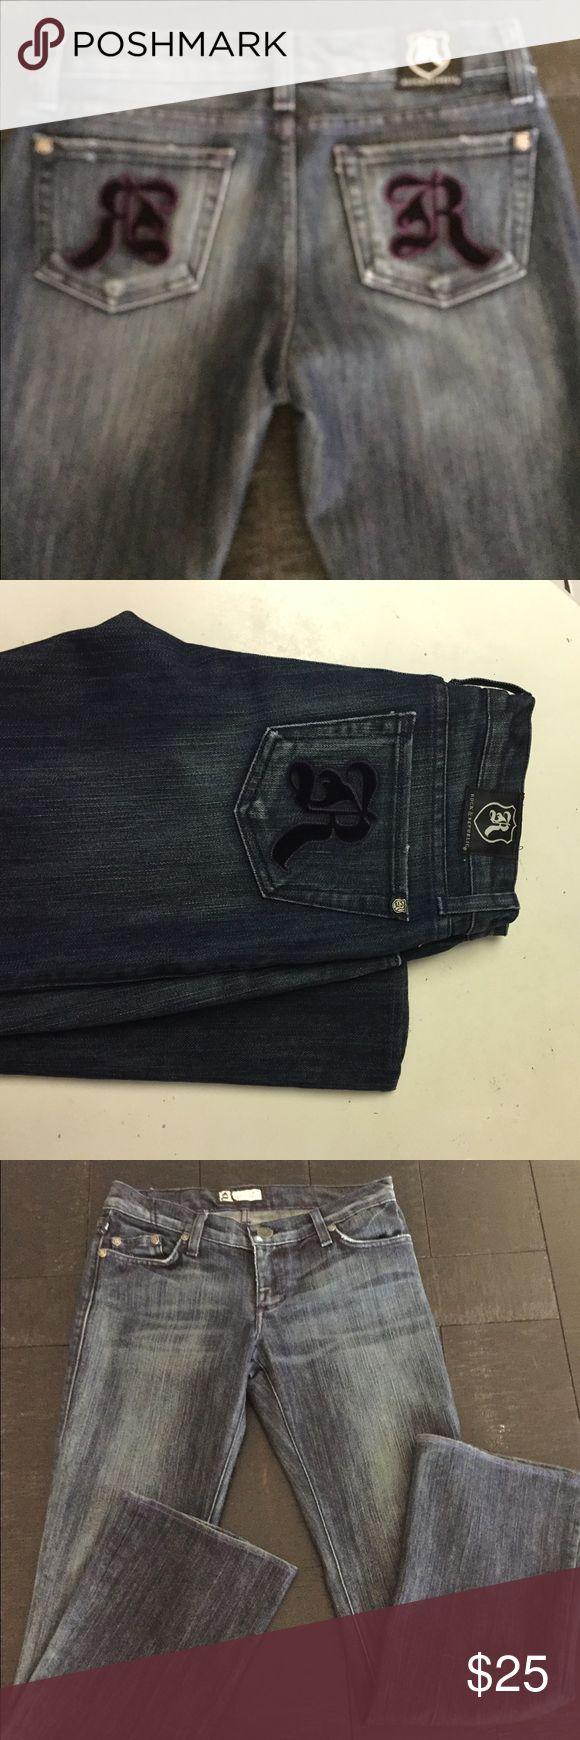 Rock & Republic Jeans Dark Denim Rock & Republic Jeans. Only wore a couple of times. Rock & Republic Jeans Flare & Wide Leg